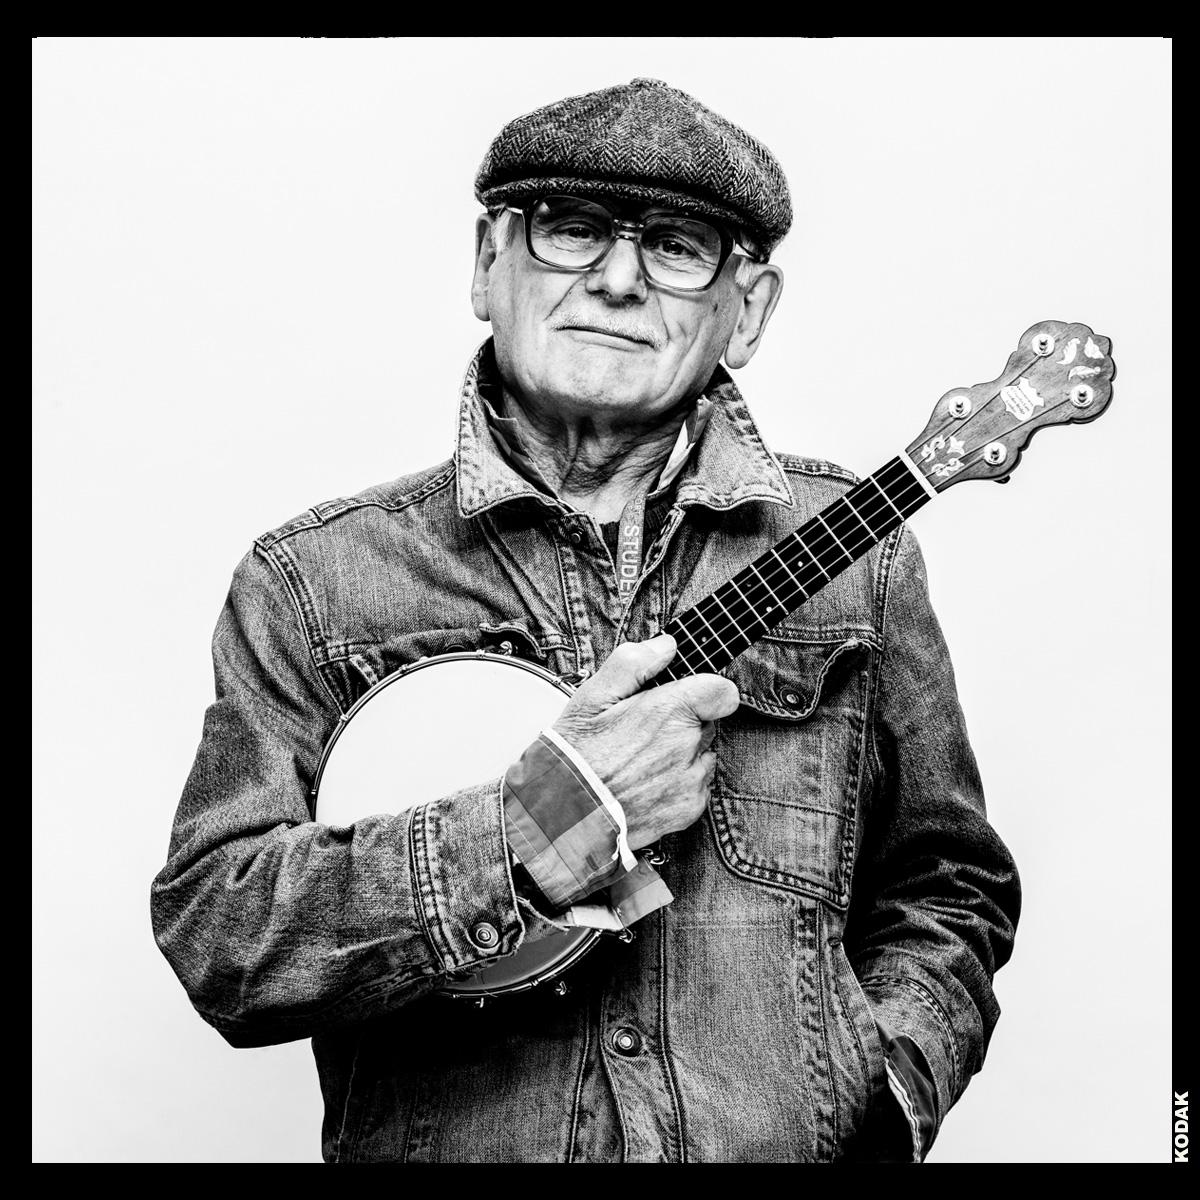 Patrick - Banjo player